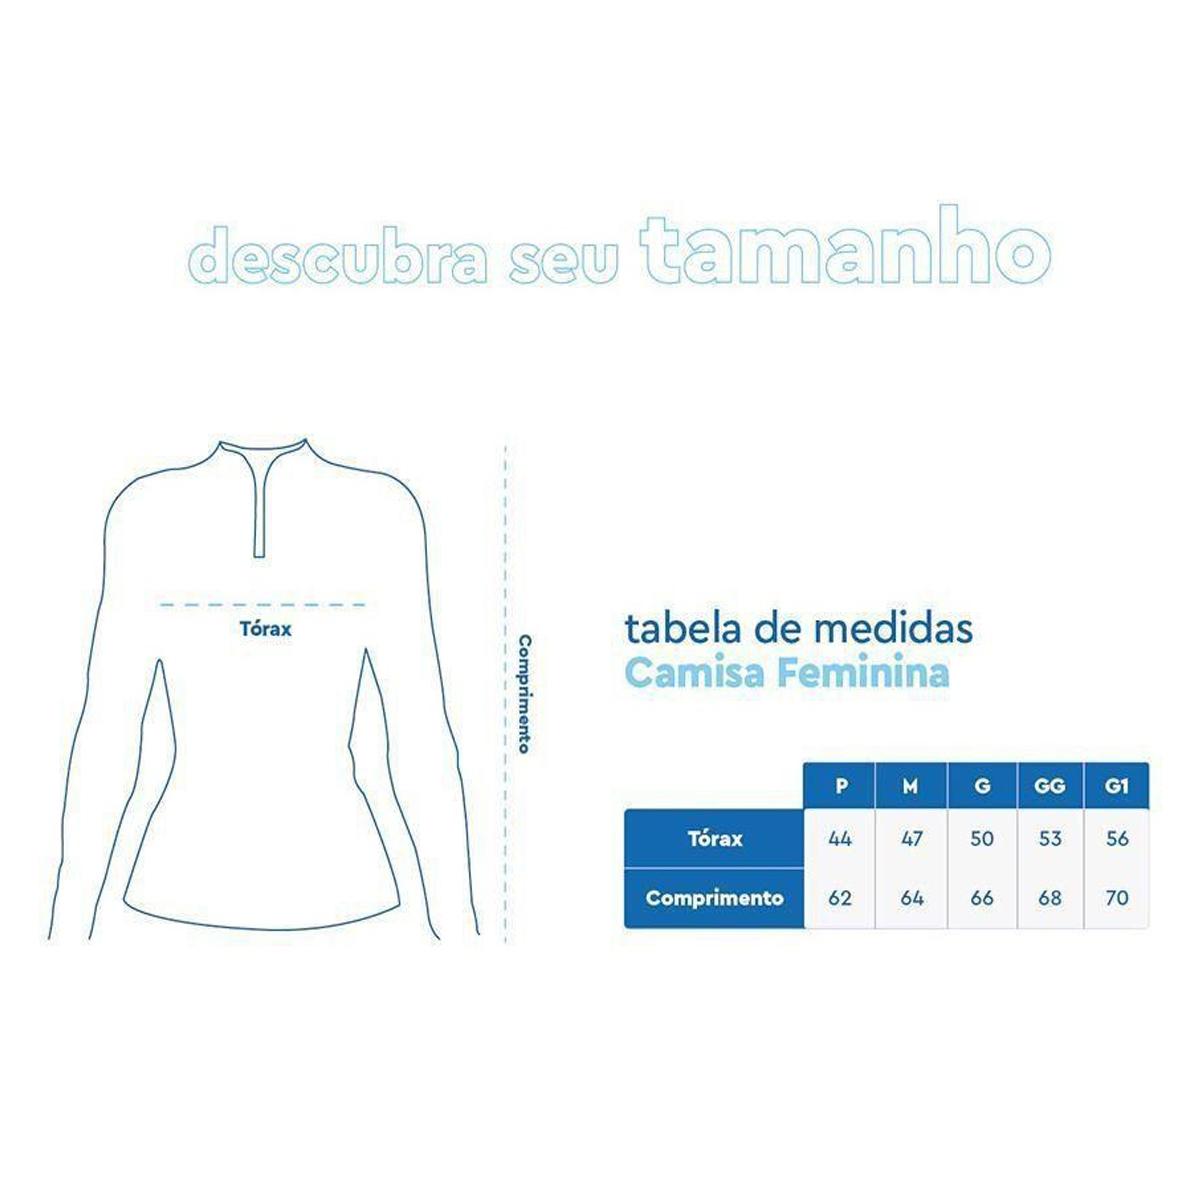 Camiseta Mar Negro Feminina 2021 Escamas  - Pró Pesca Shop